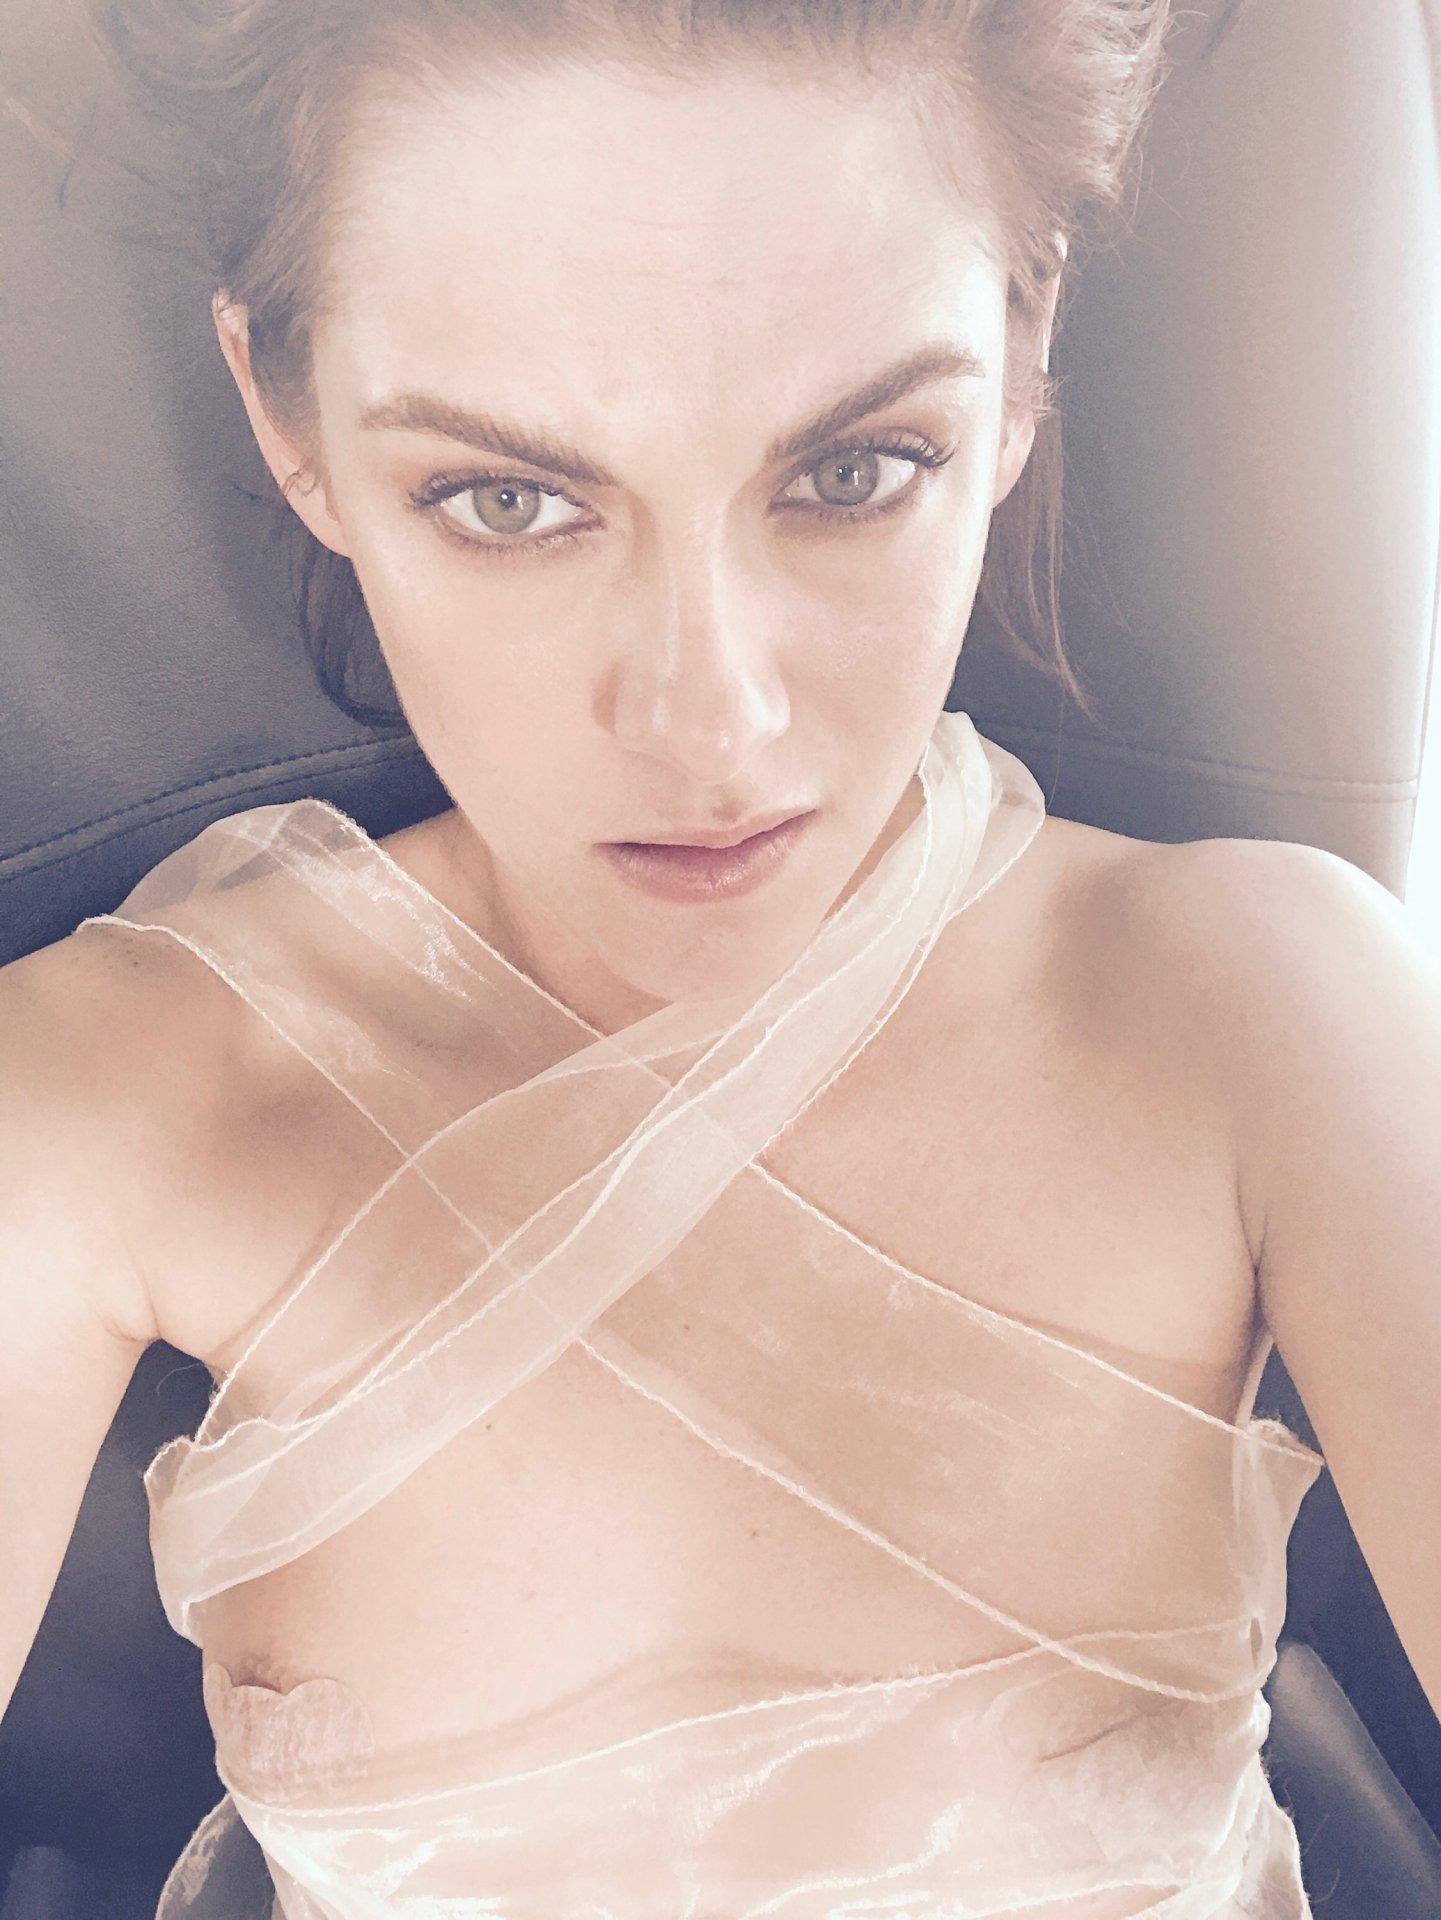 Kristen stewart leaked pics